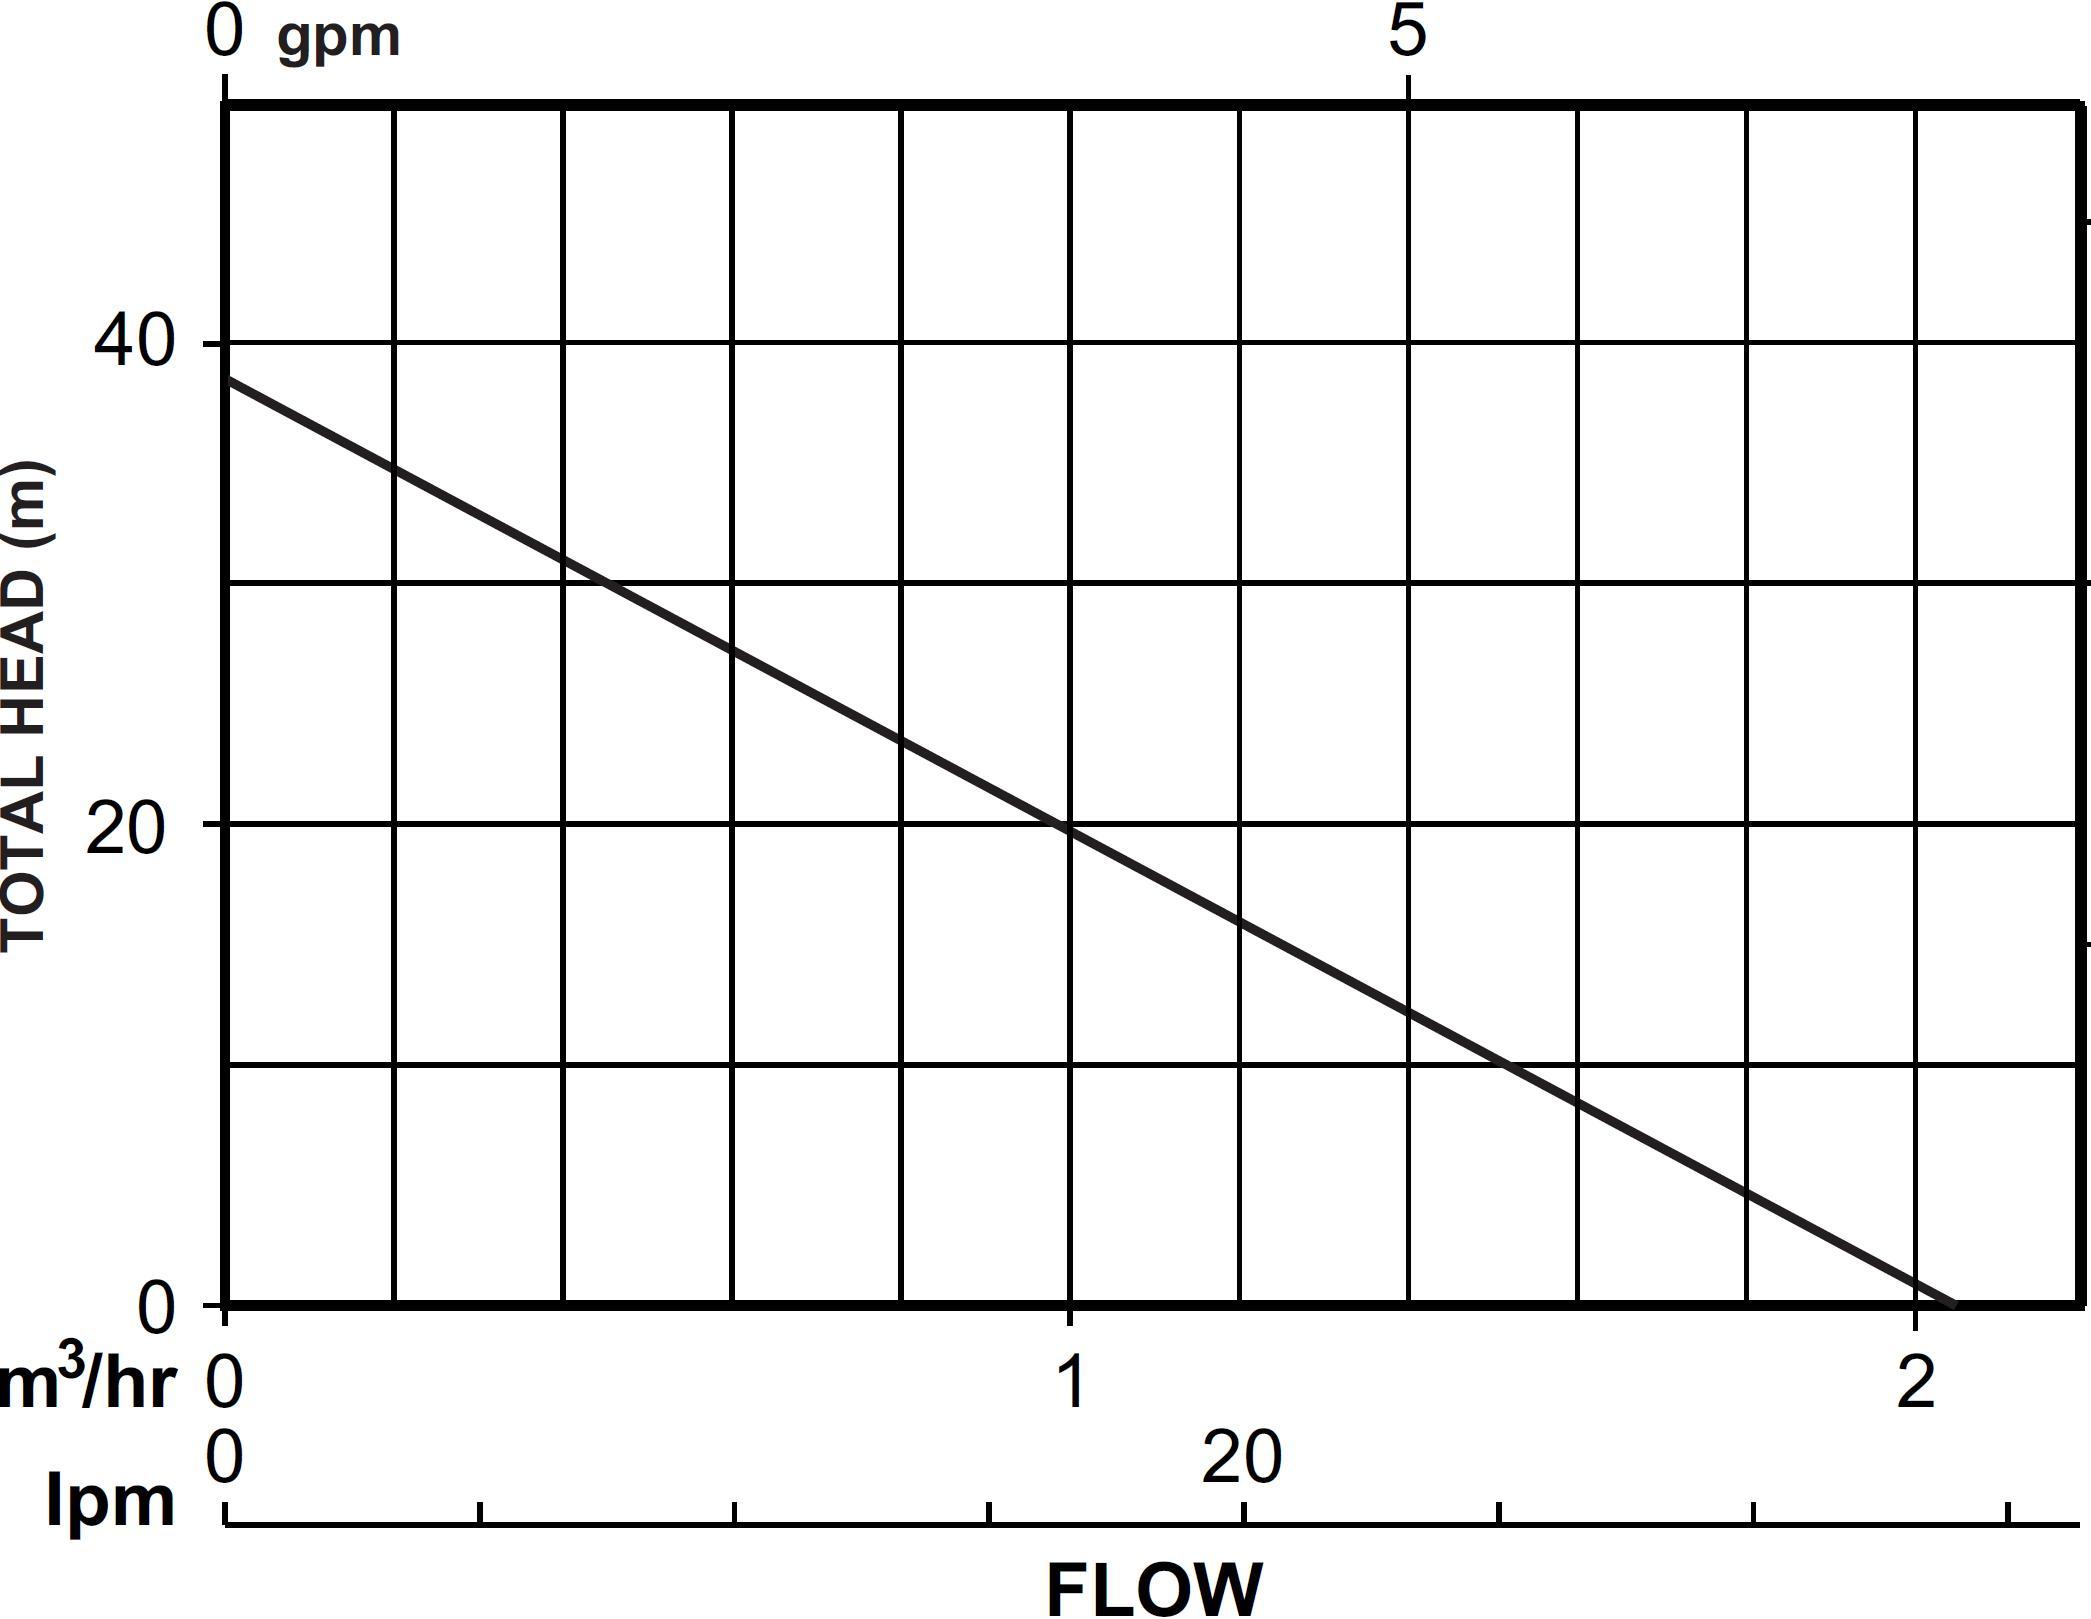 Perpheral Turbine Pump Curve